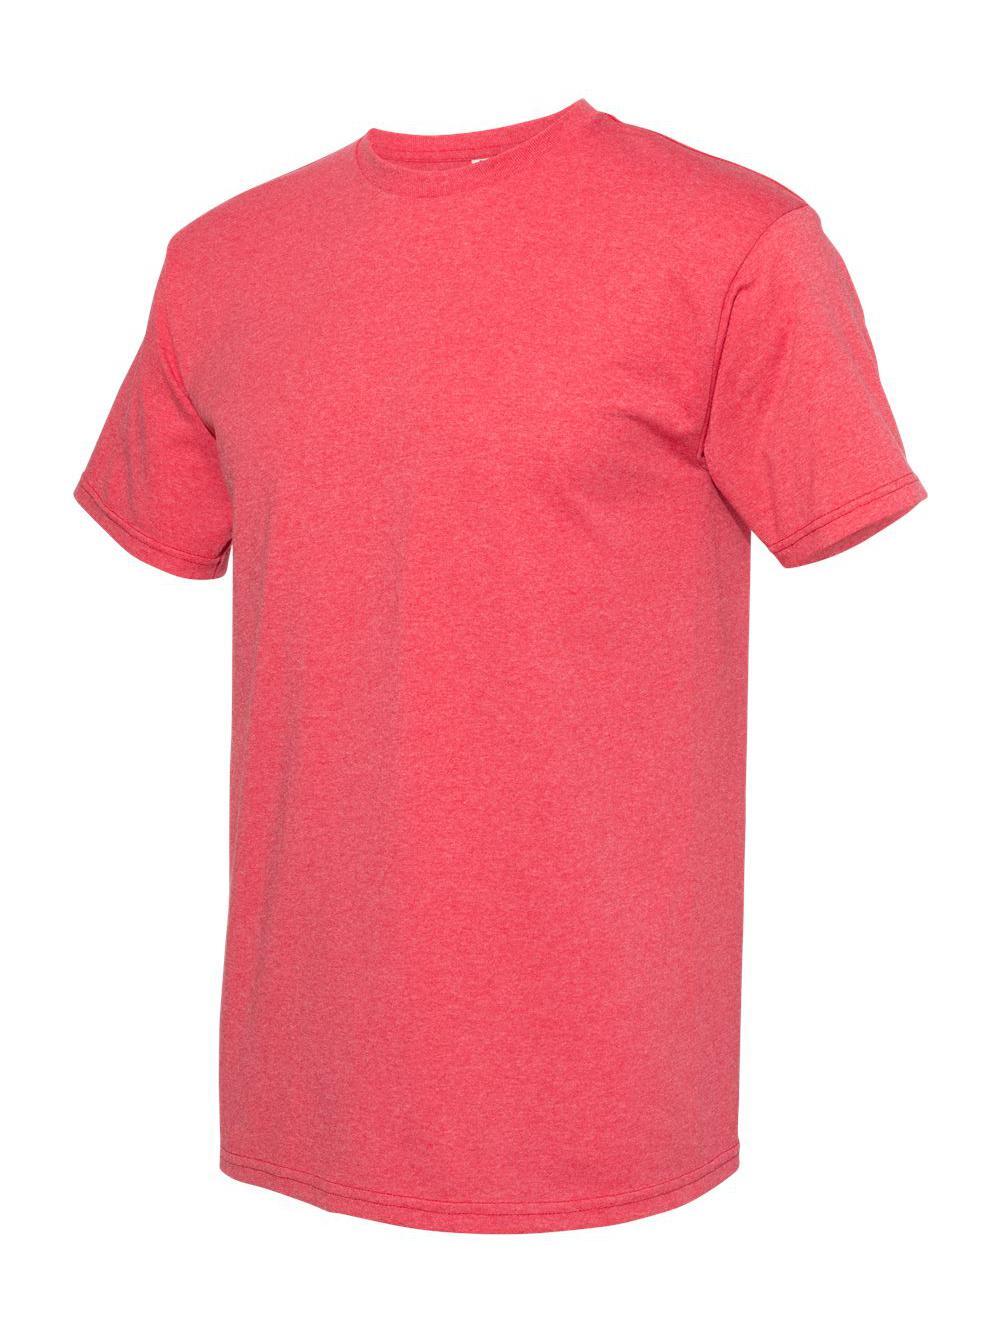 ALSTYLE-Premium-T-Shirt-1701 thumbnail 45